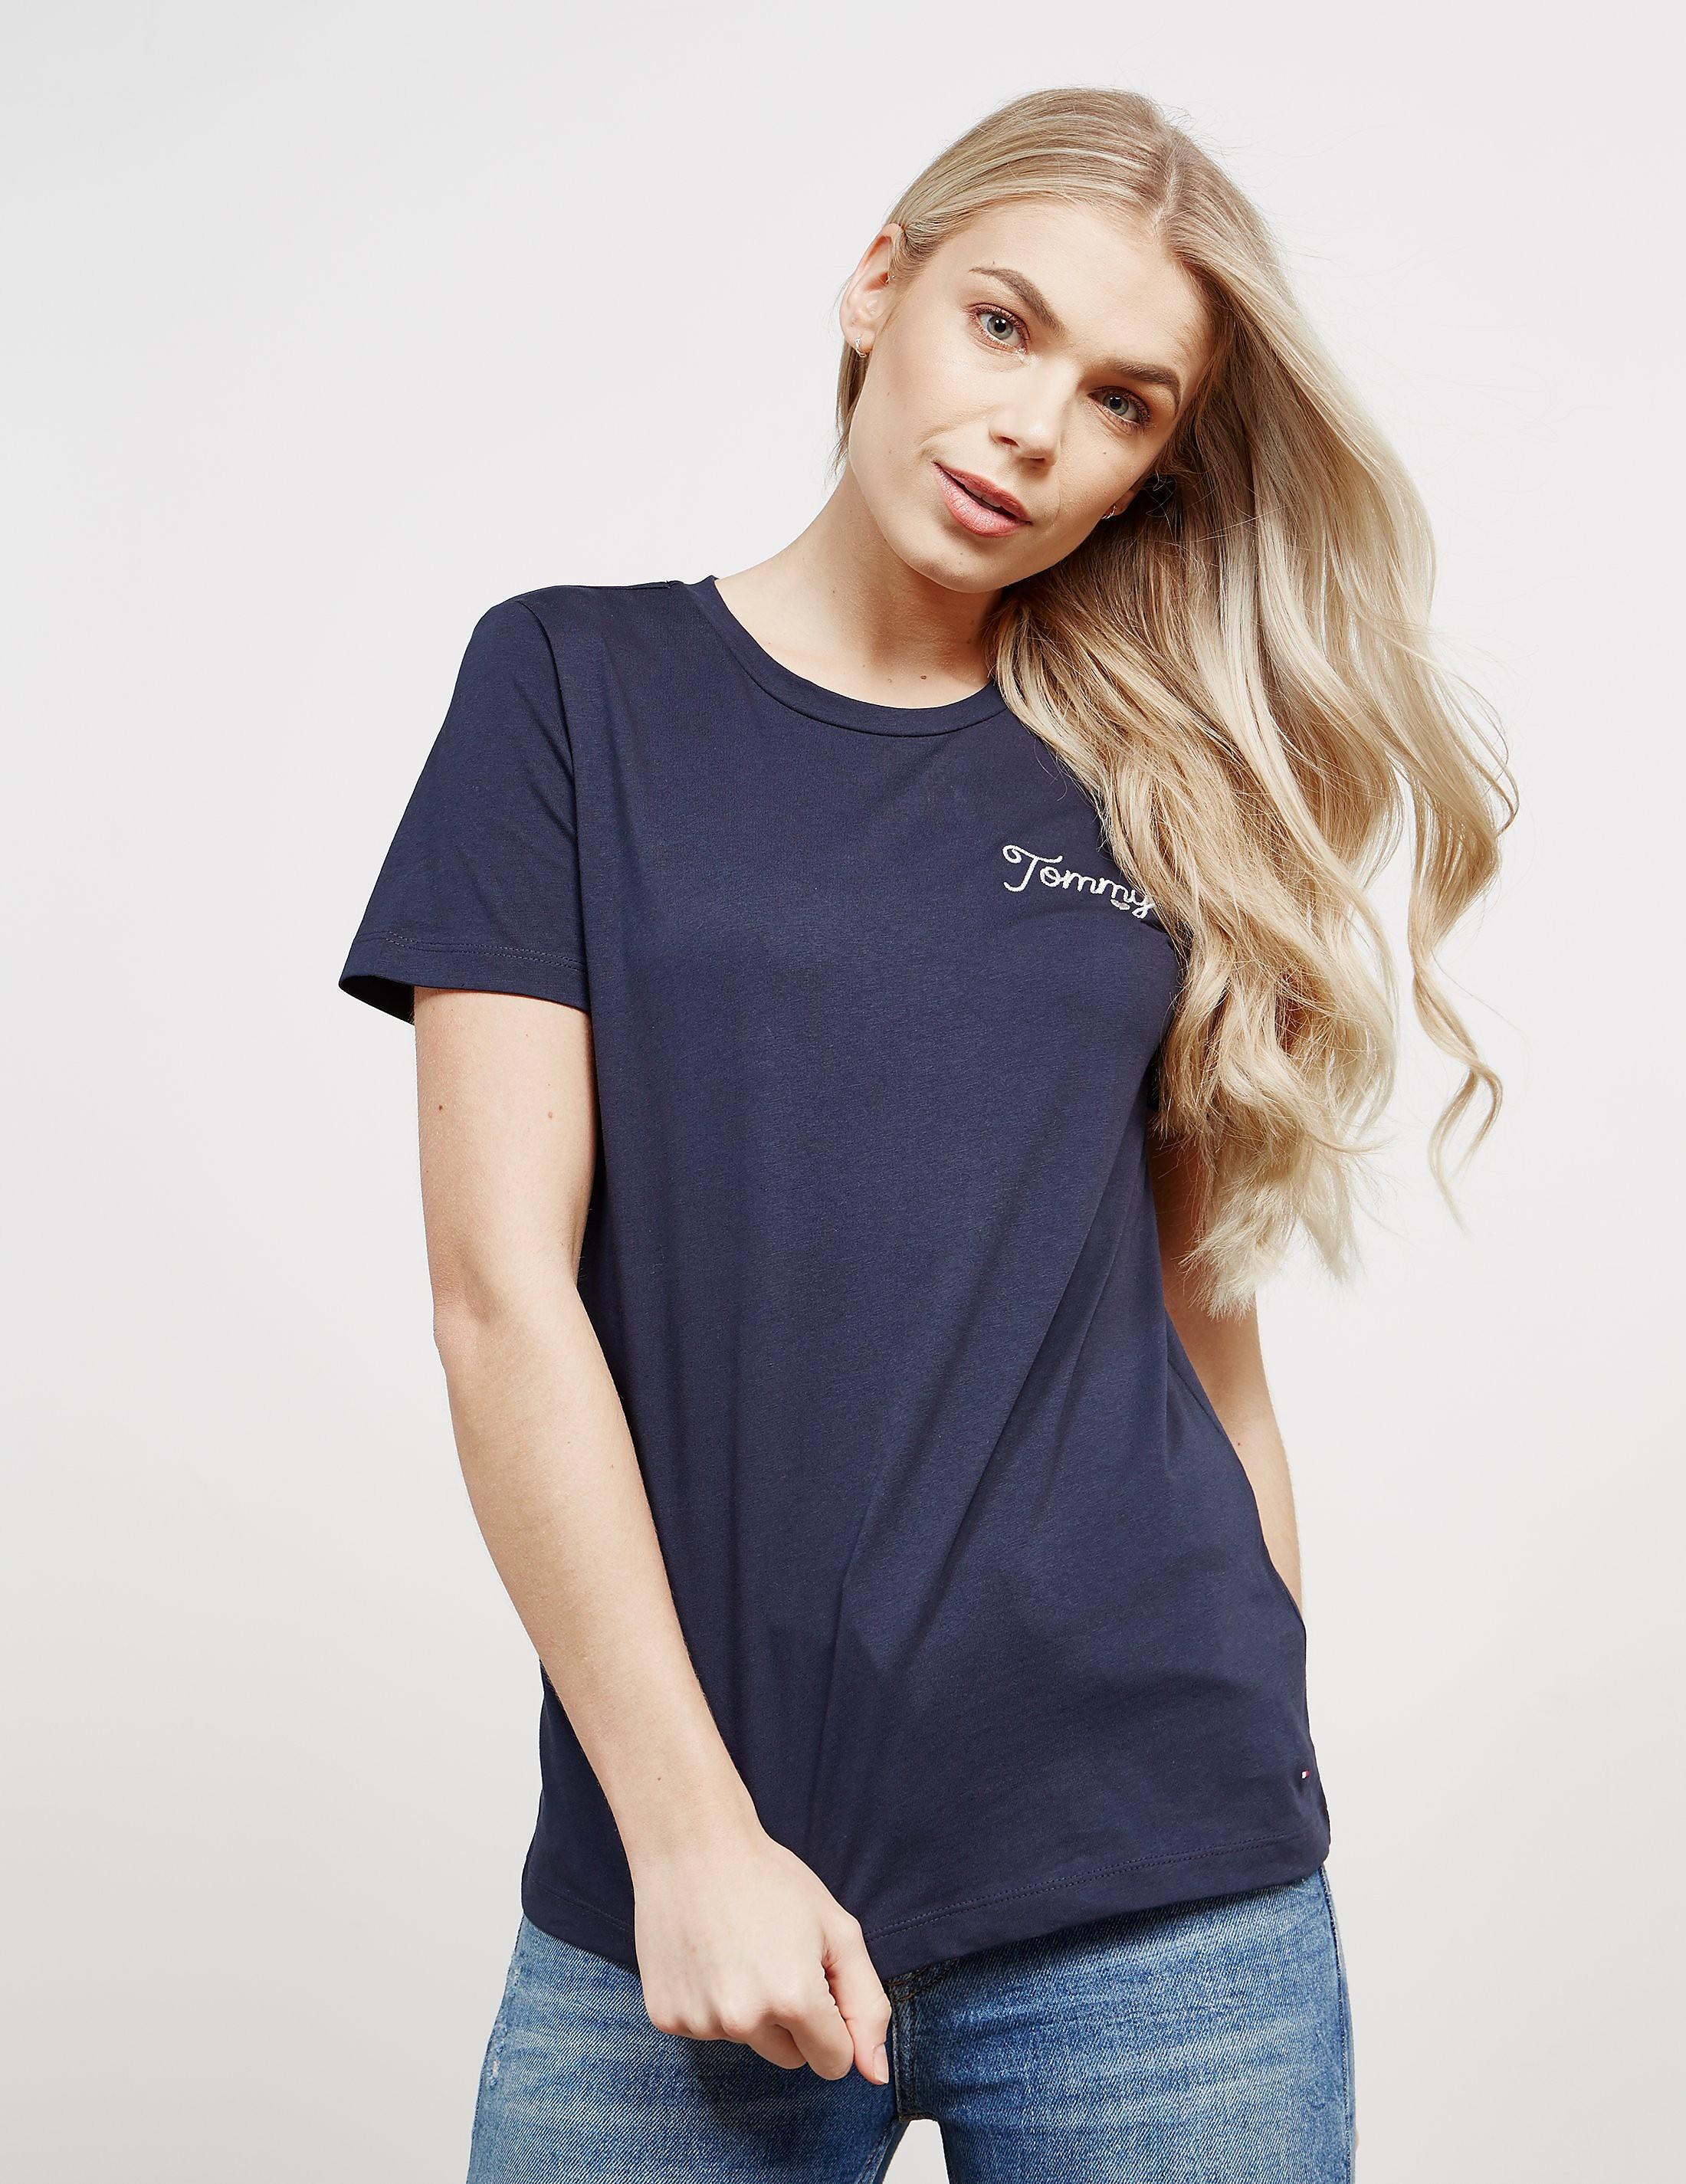 Tommy Hilfiger Small Logo Short Sleeve T-Shirt